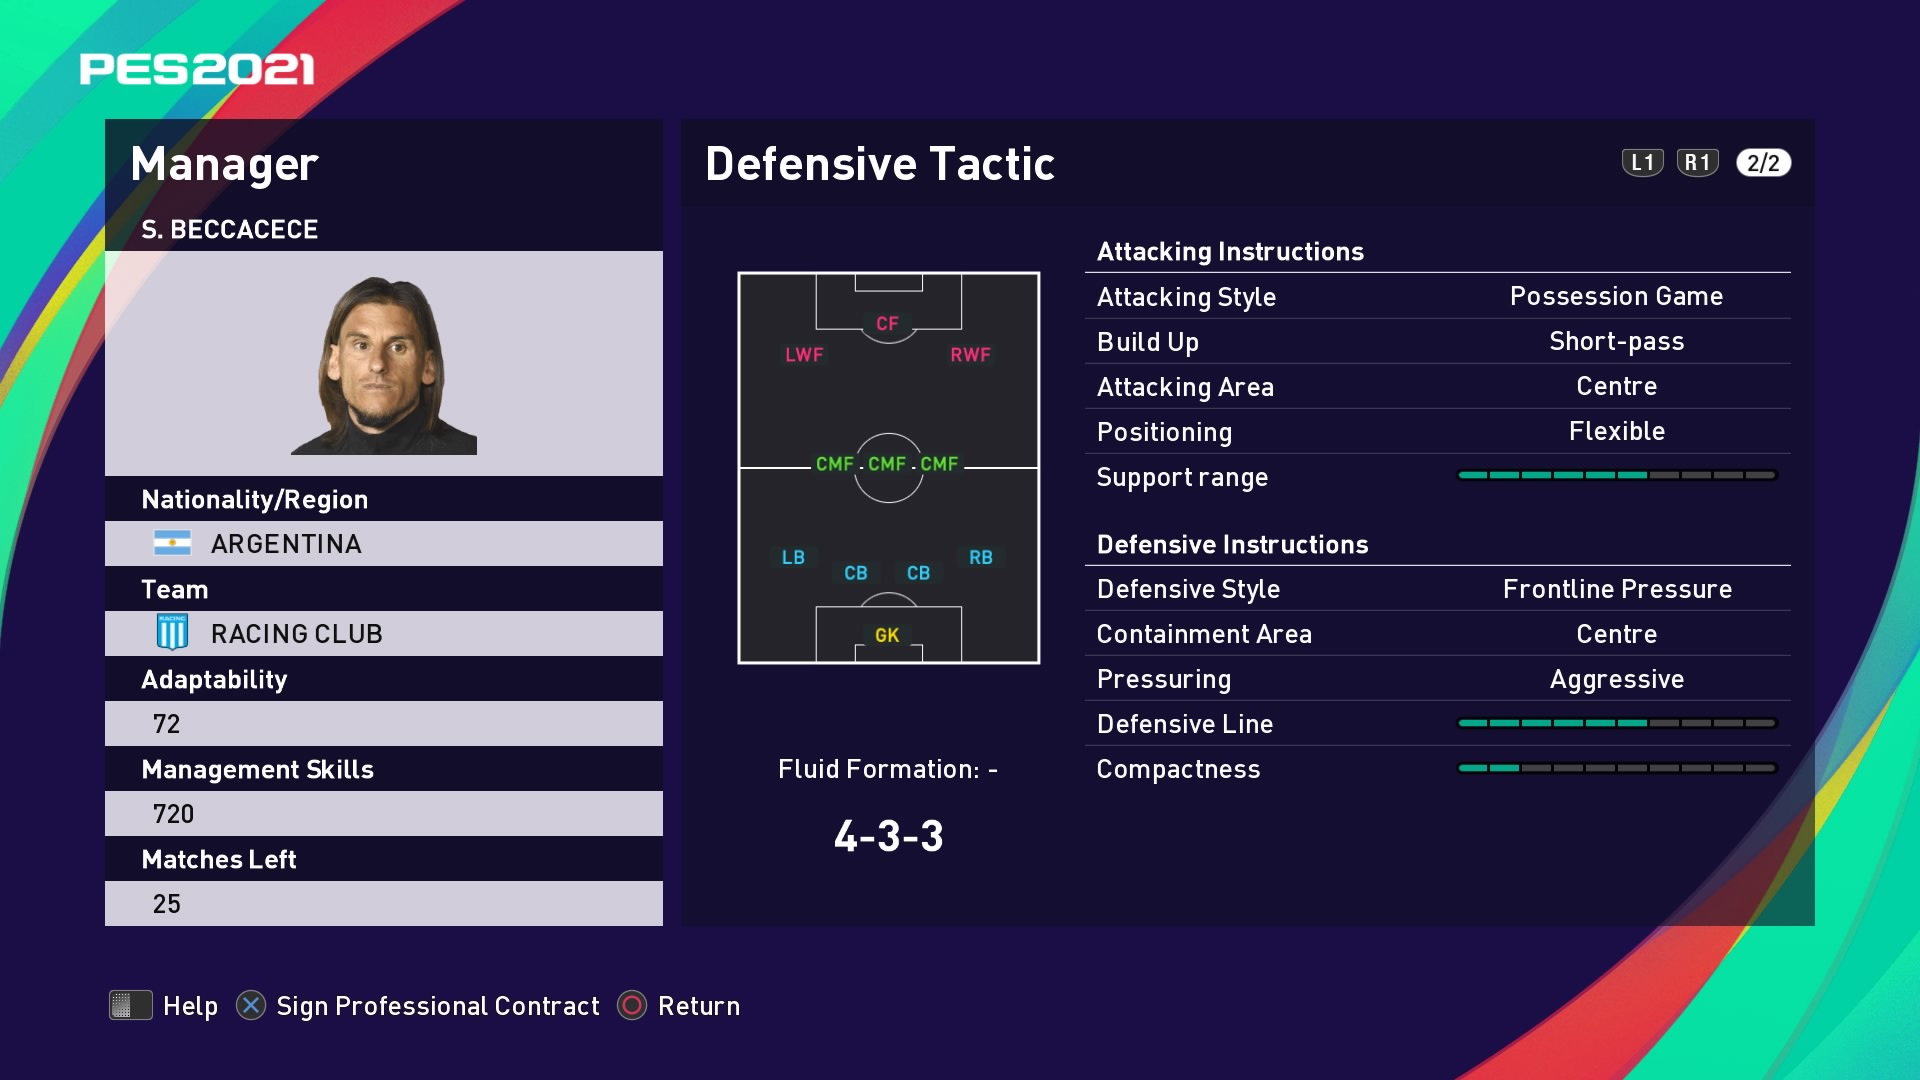 S. Beccacece (Sebastián Beccacece) Defensive Tactic in PES 2021 myClub